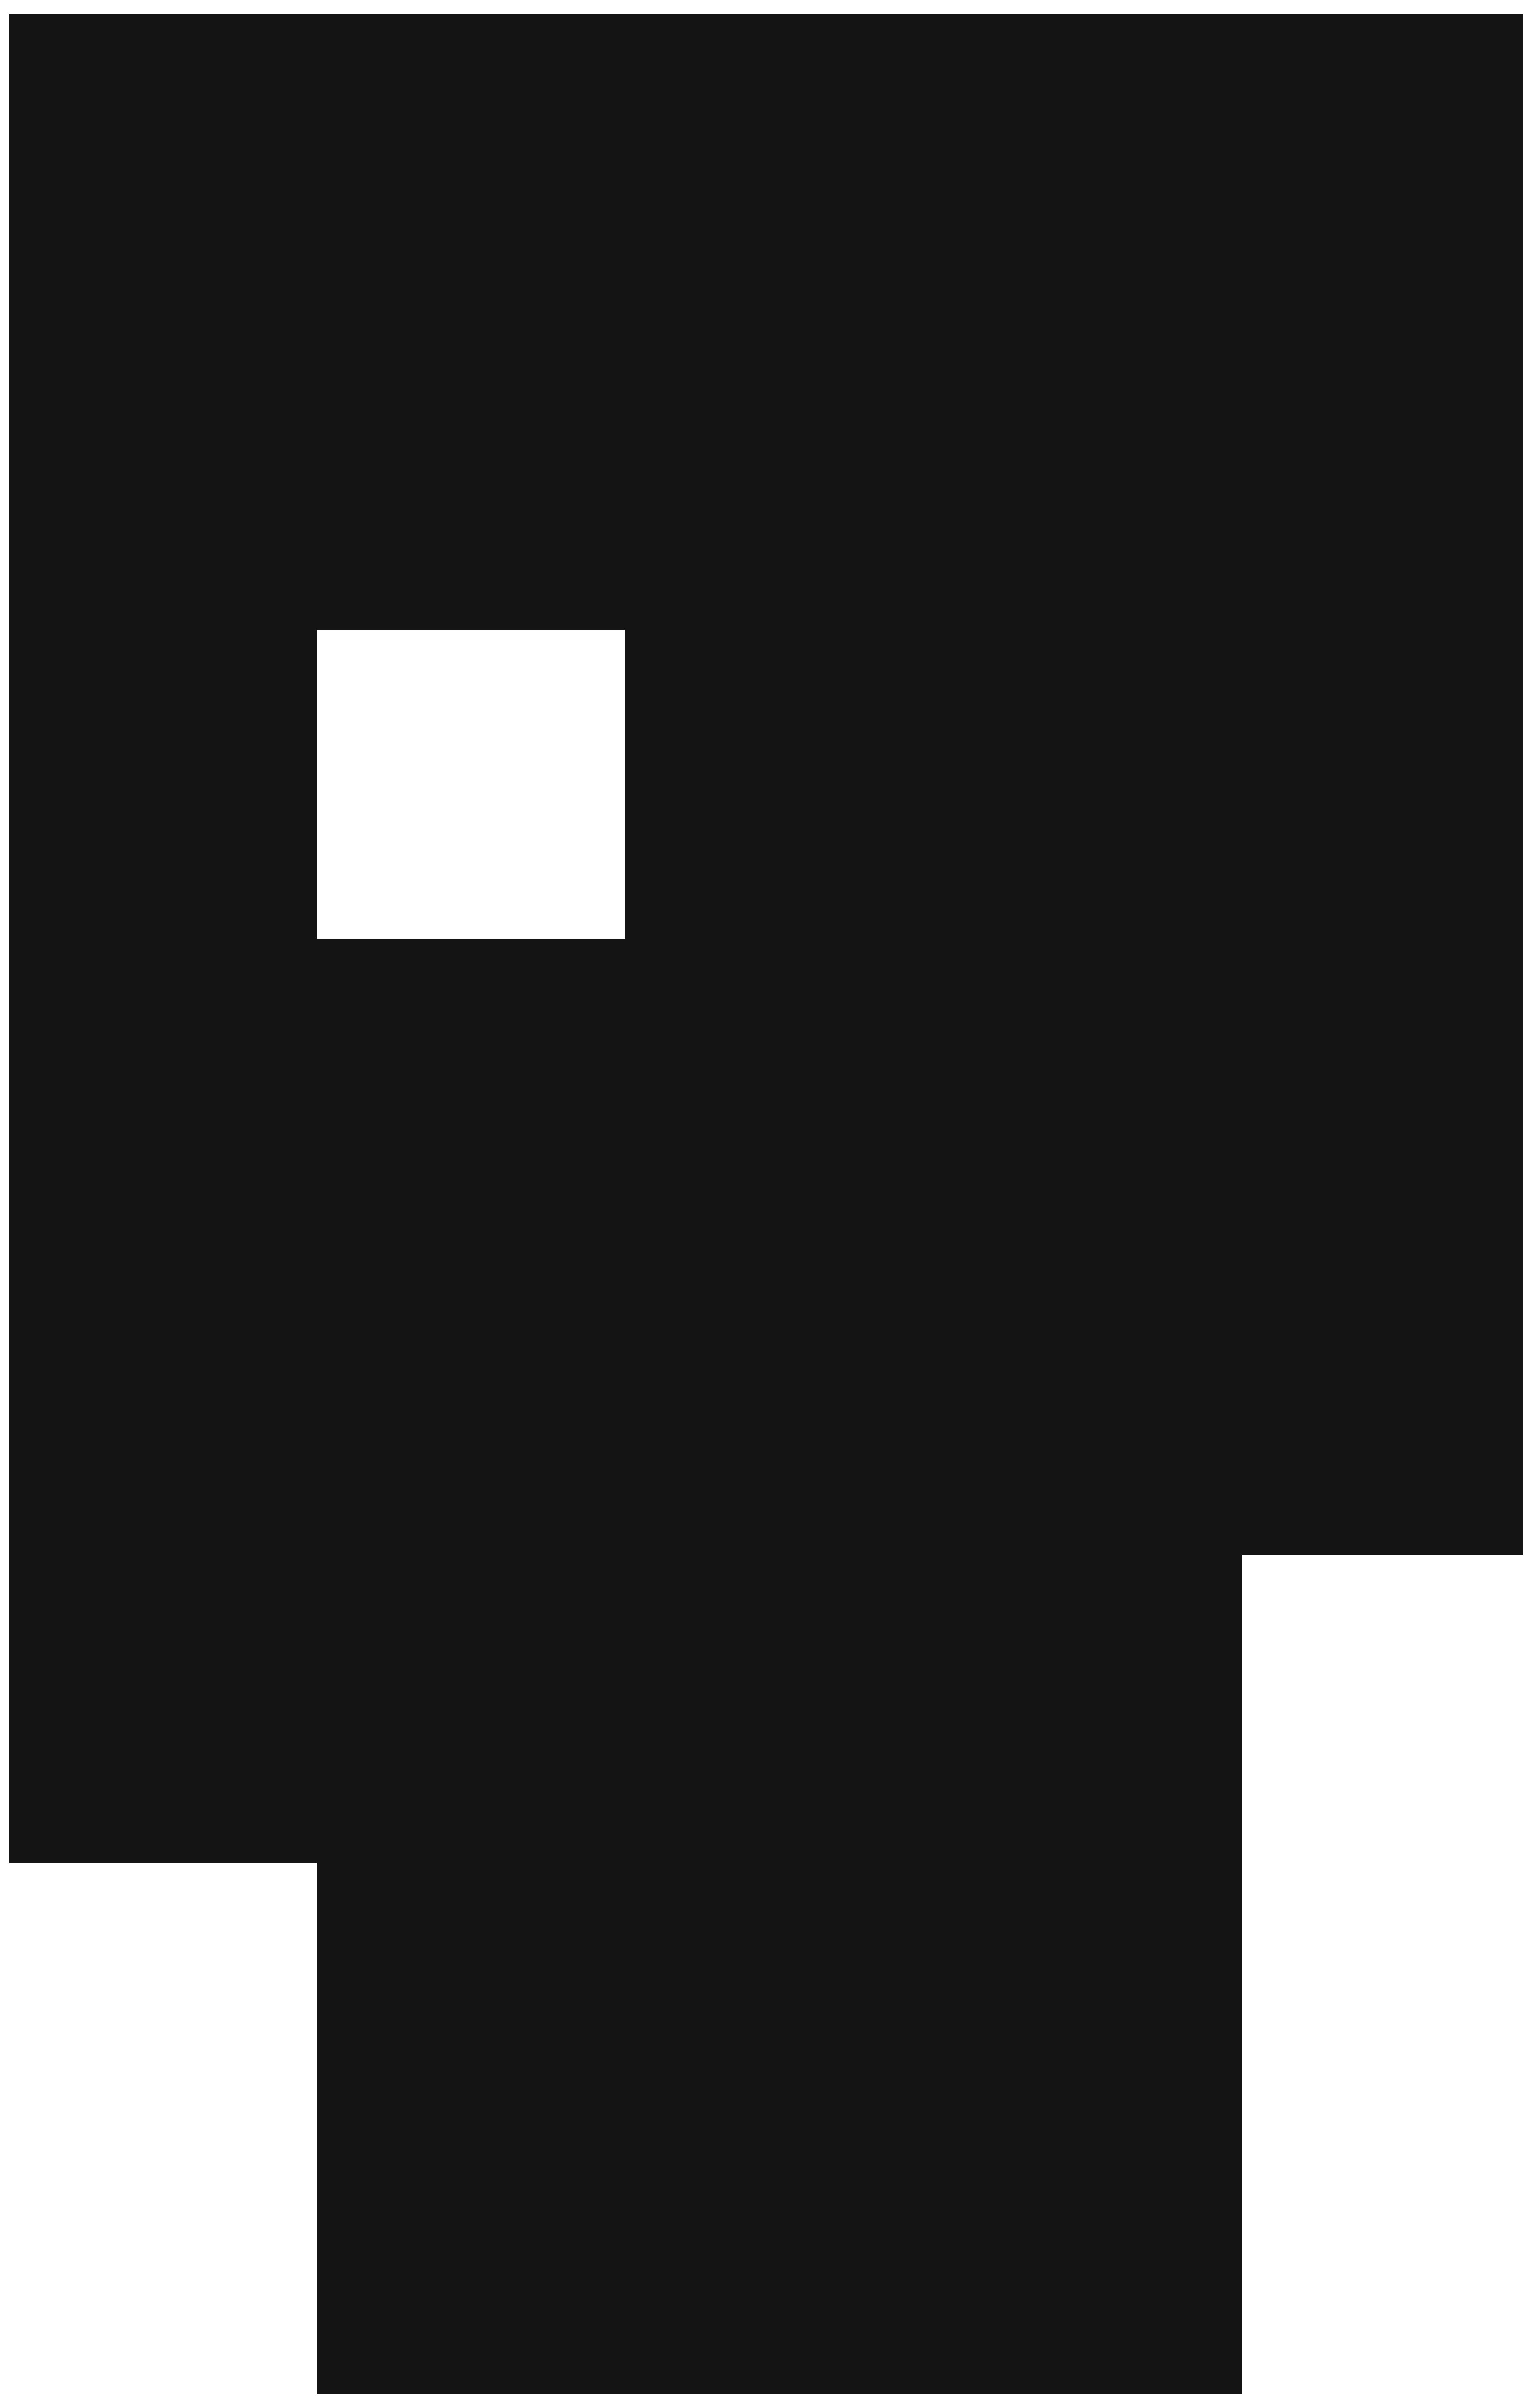 Hipster Face Transparent Clip Art Image.